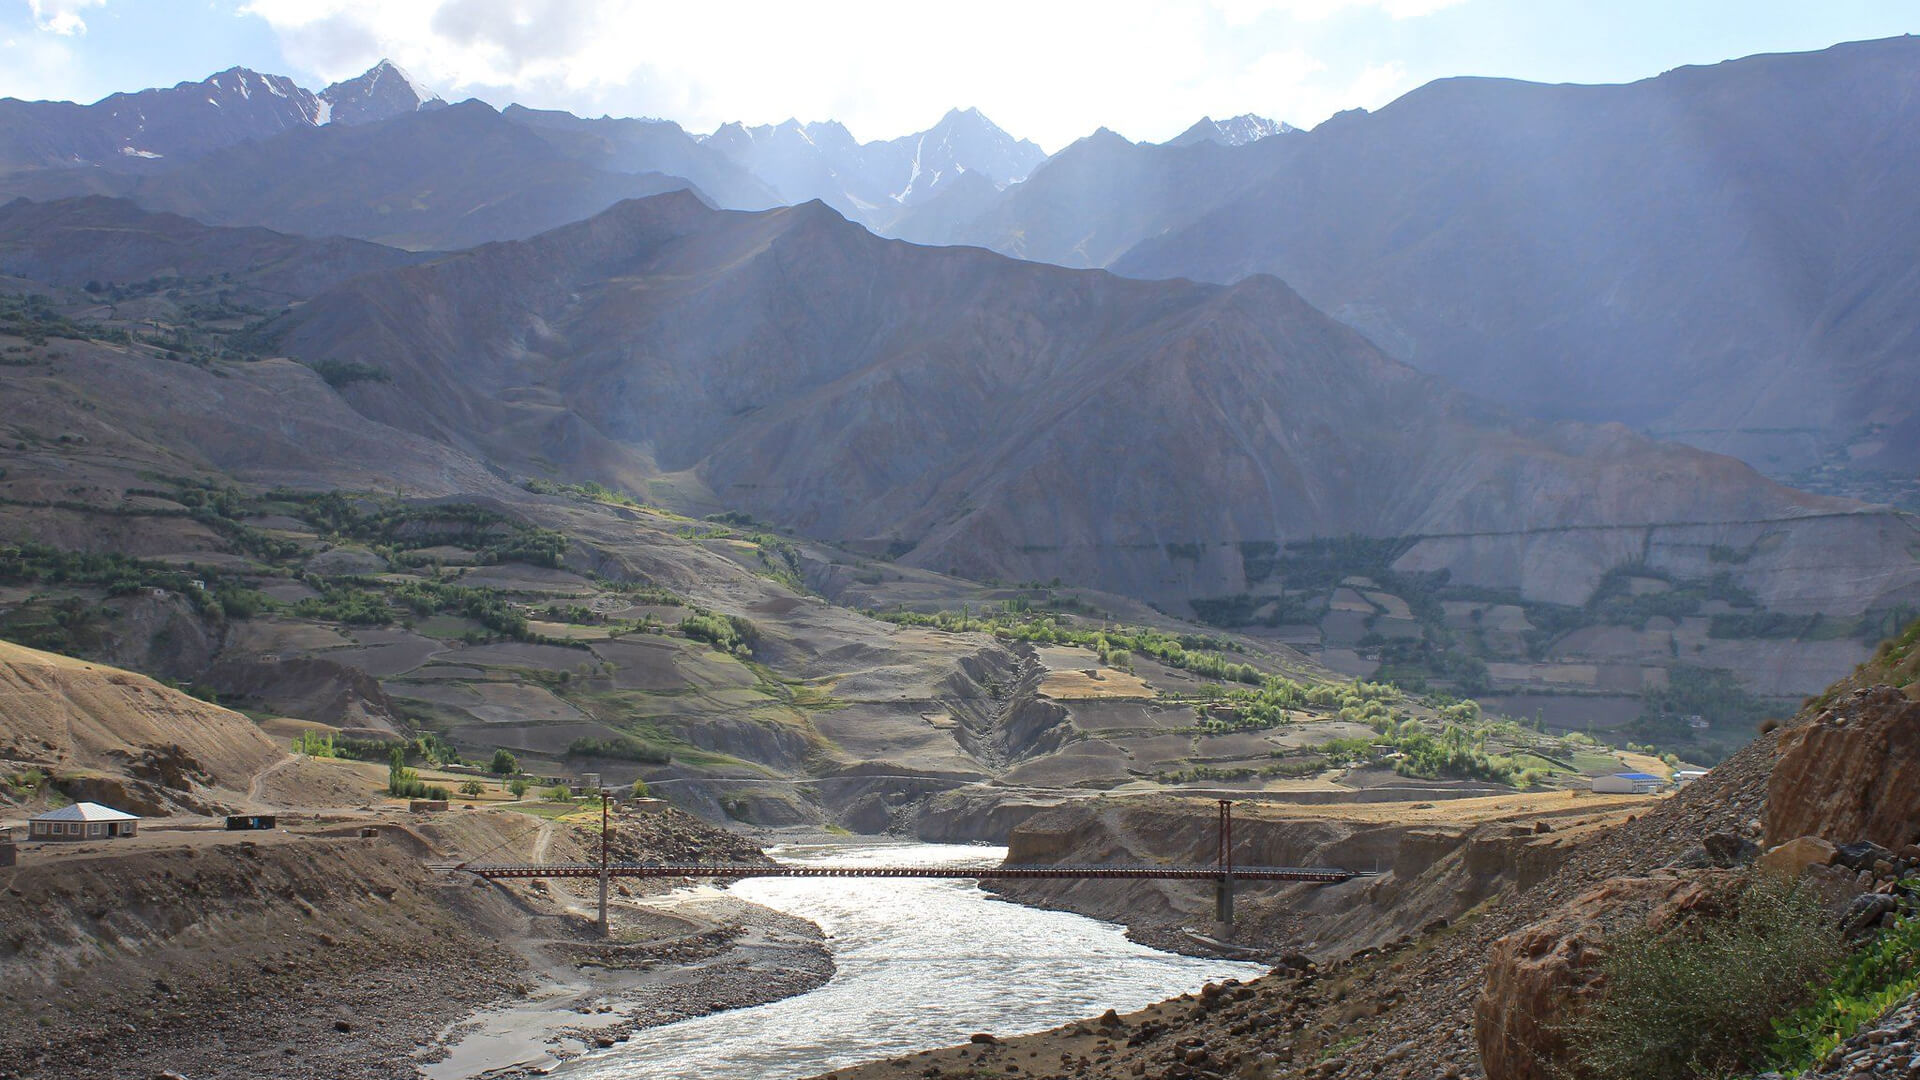 Cross-border bridges, Afghanistan to Tajikistan